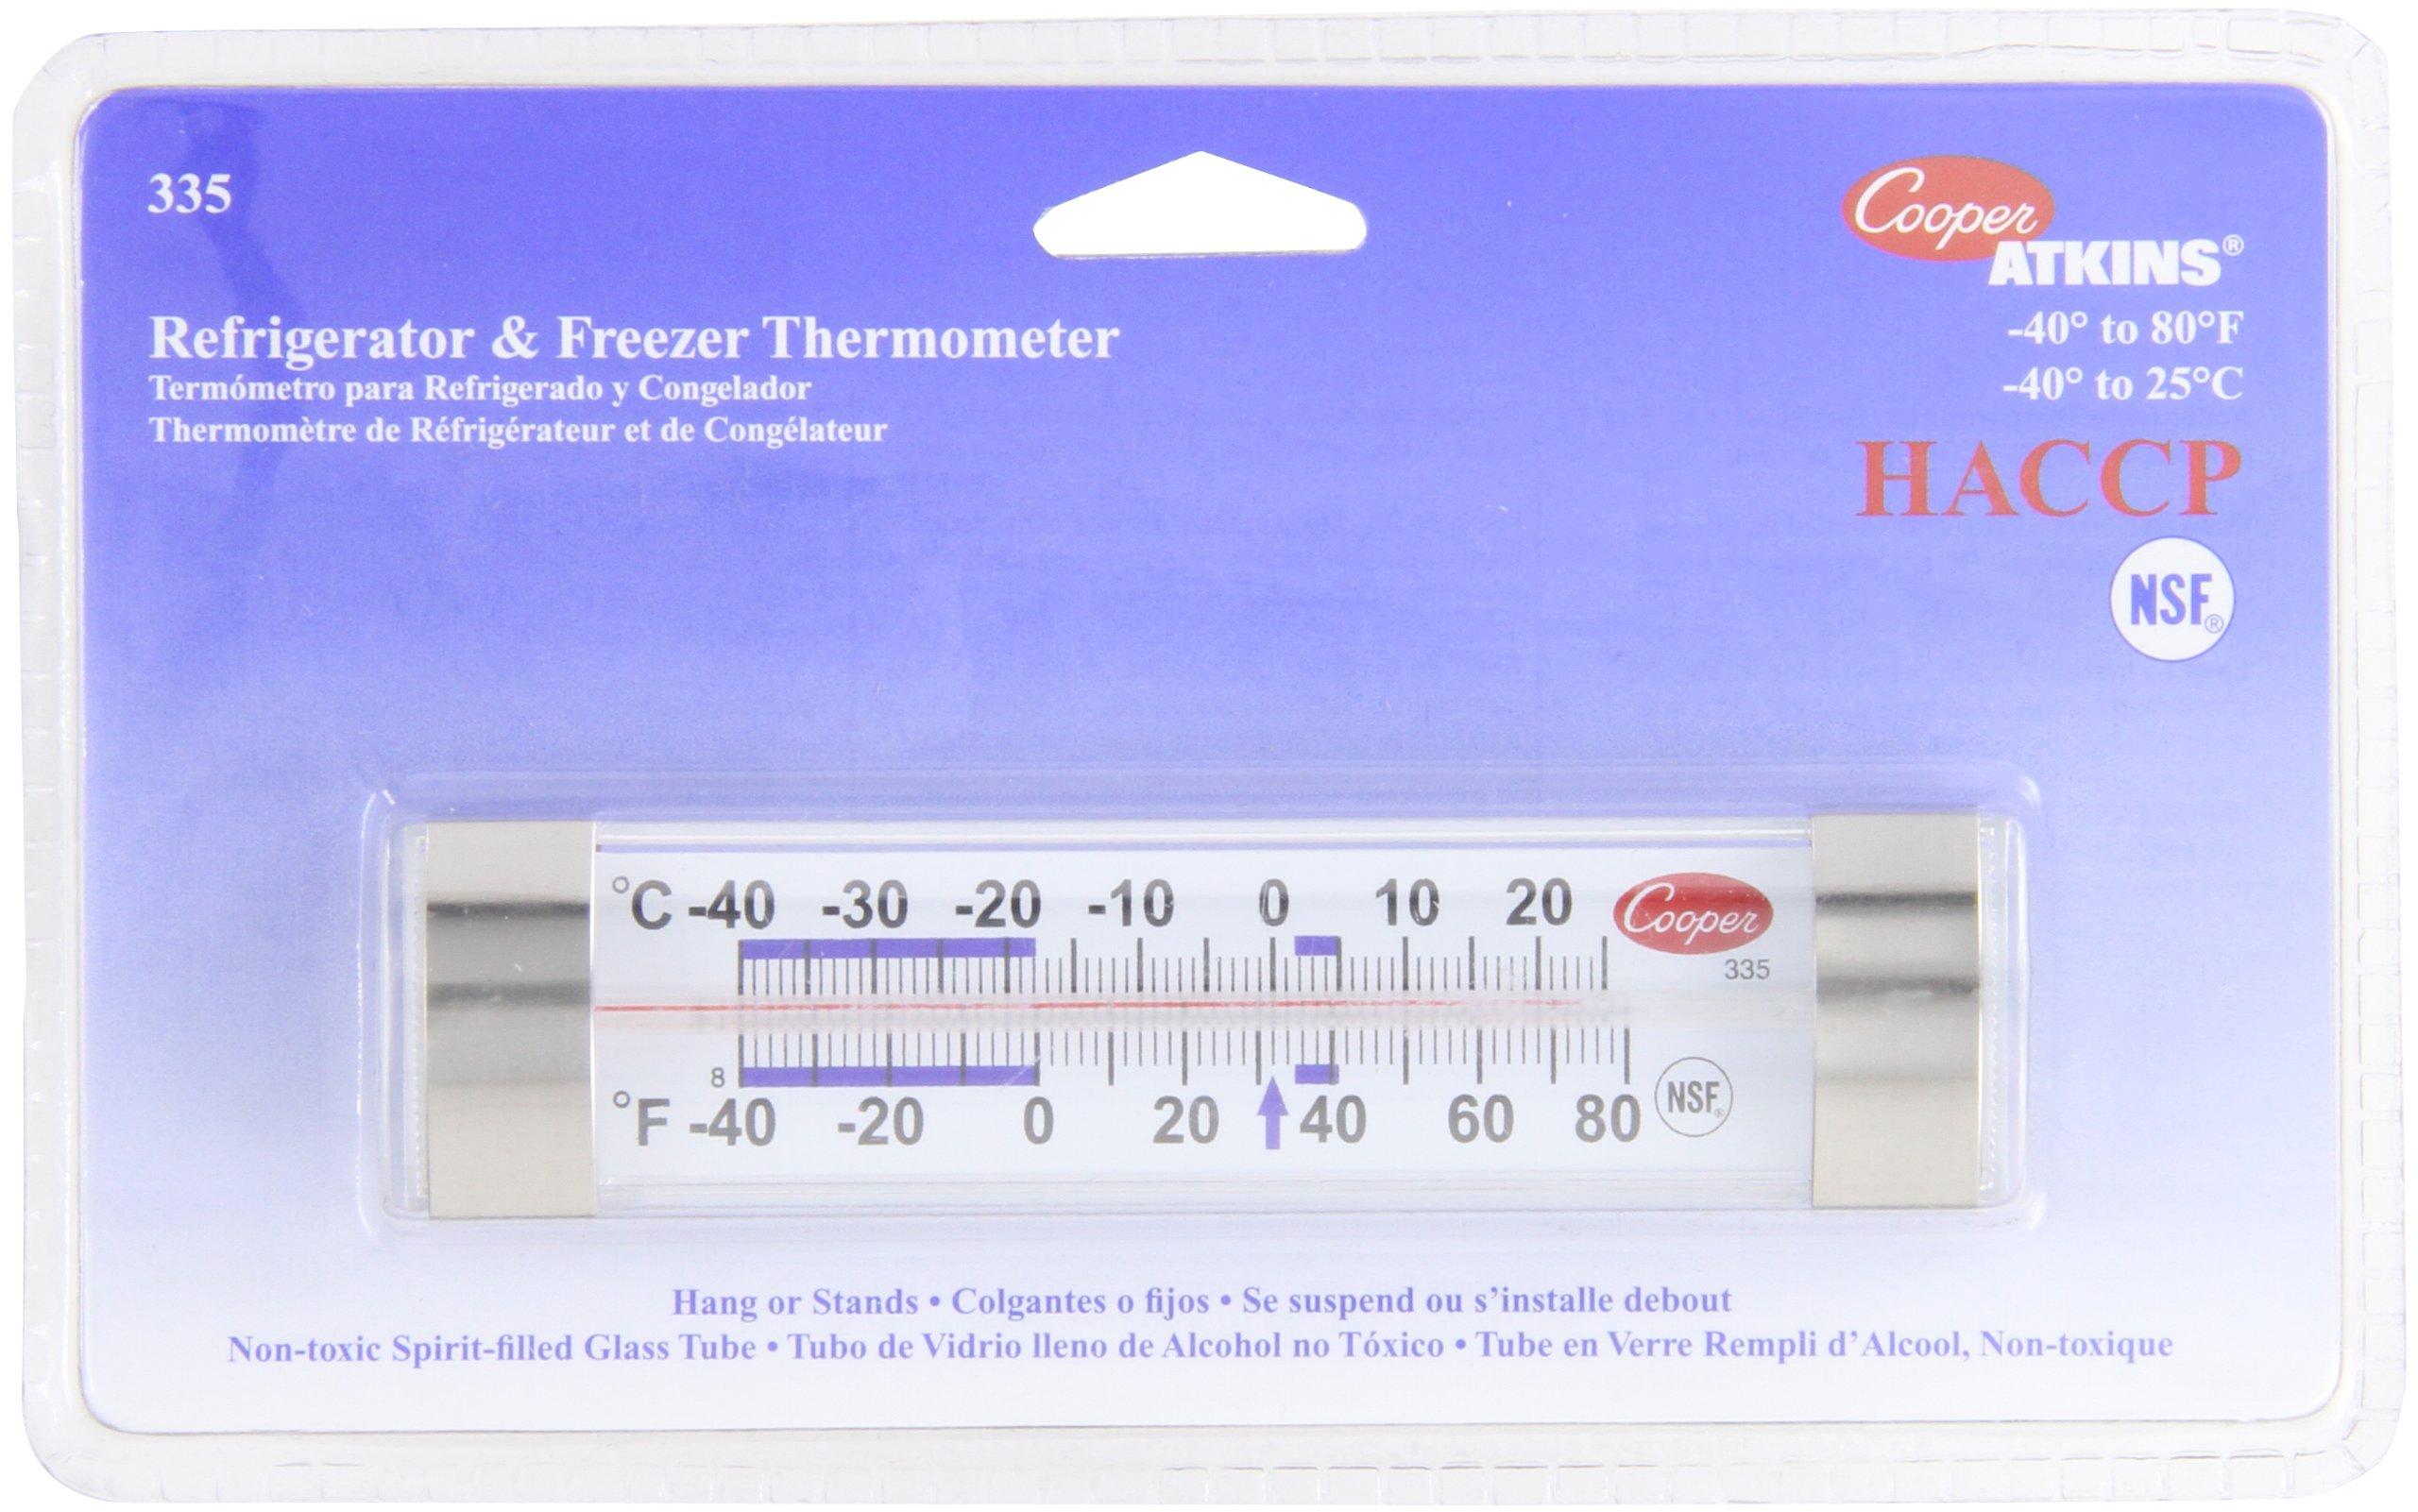 Cooper-Atkins 335-01-1 Commercial Refrigerator Thermometer, Commercial Freezer Thermometer (Glass Tube Thermometer, Commercial Grade Thermometer)